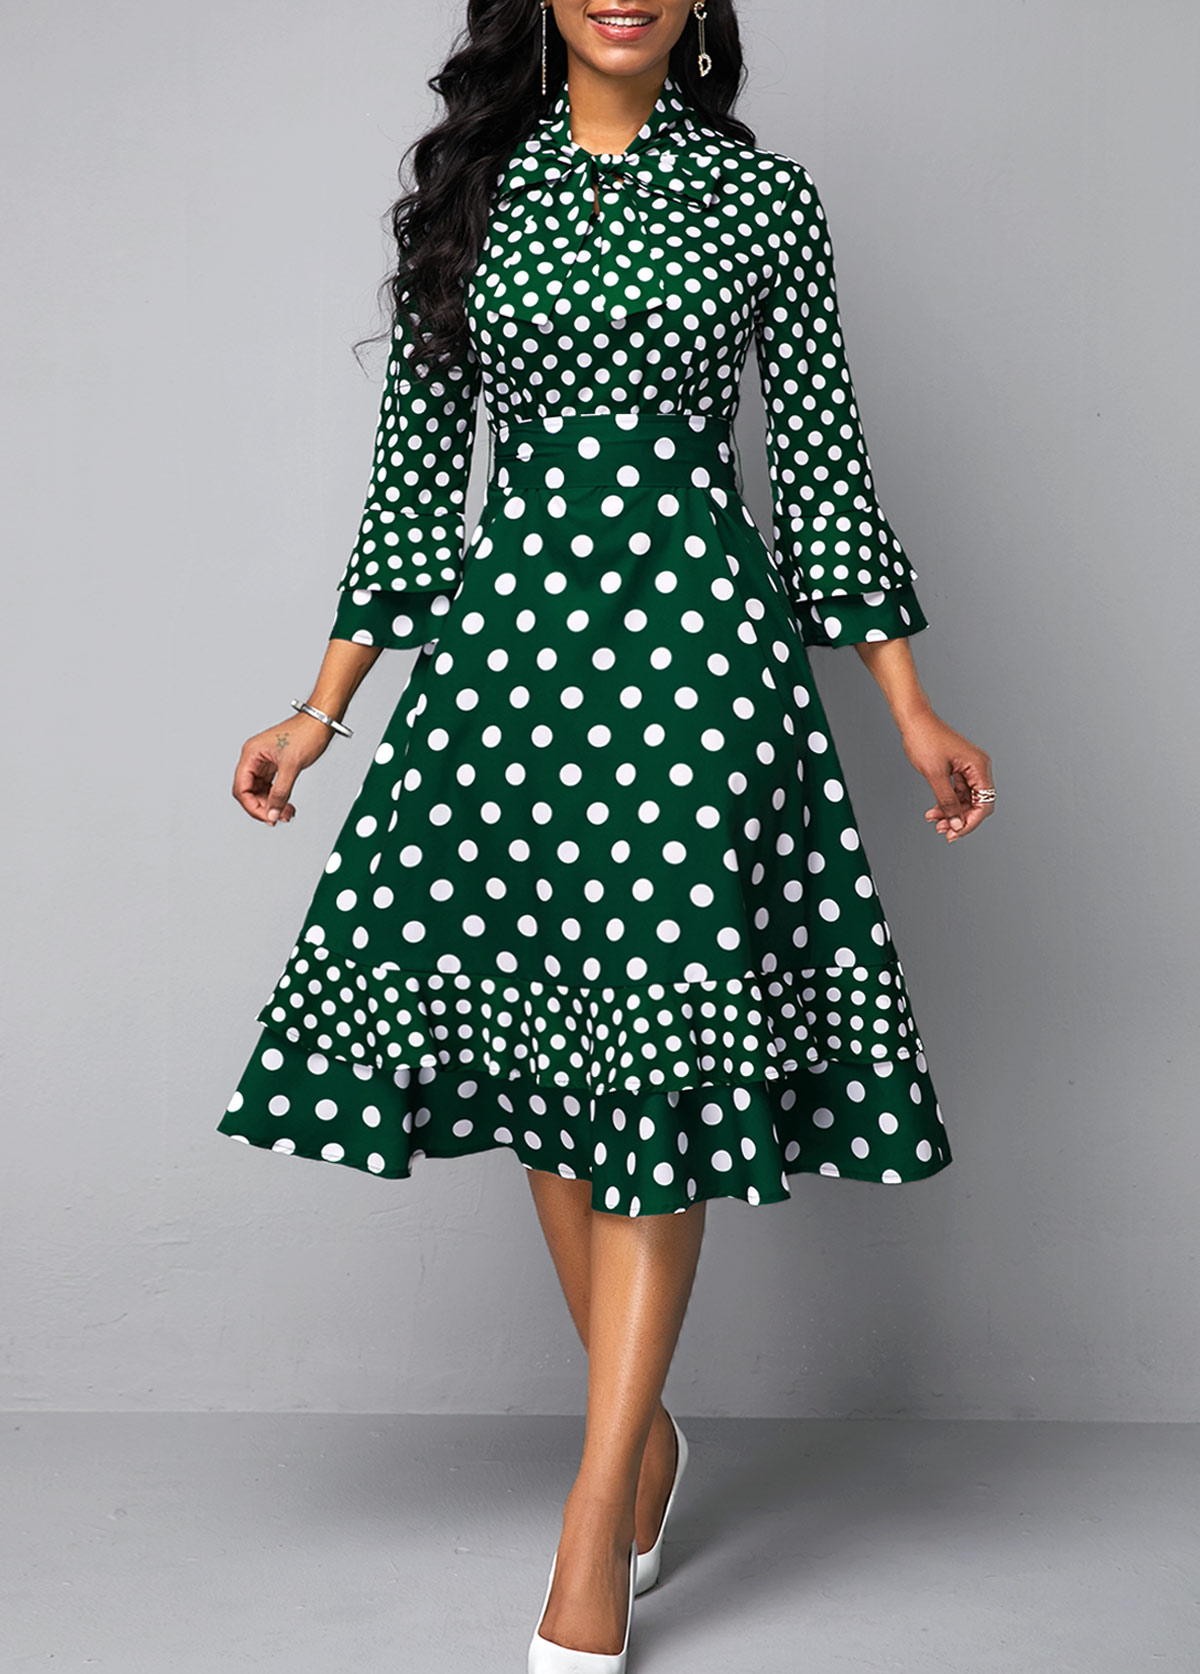 Layered Bell Sleeve Bowknot Detail Dot Print Dress